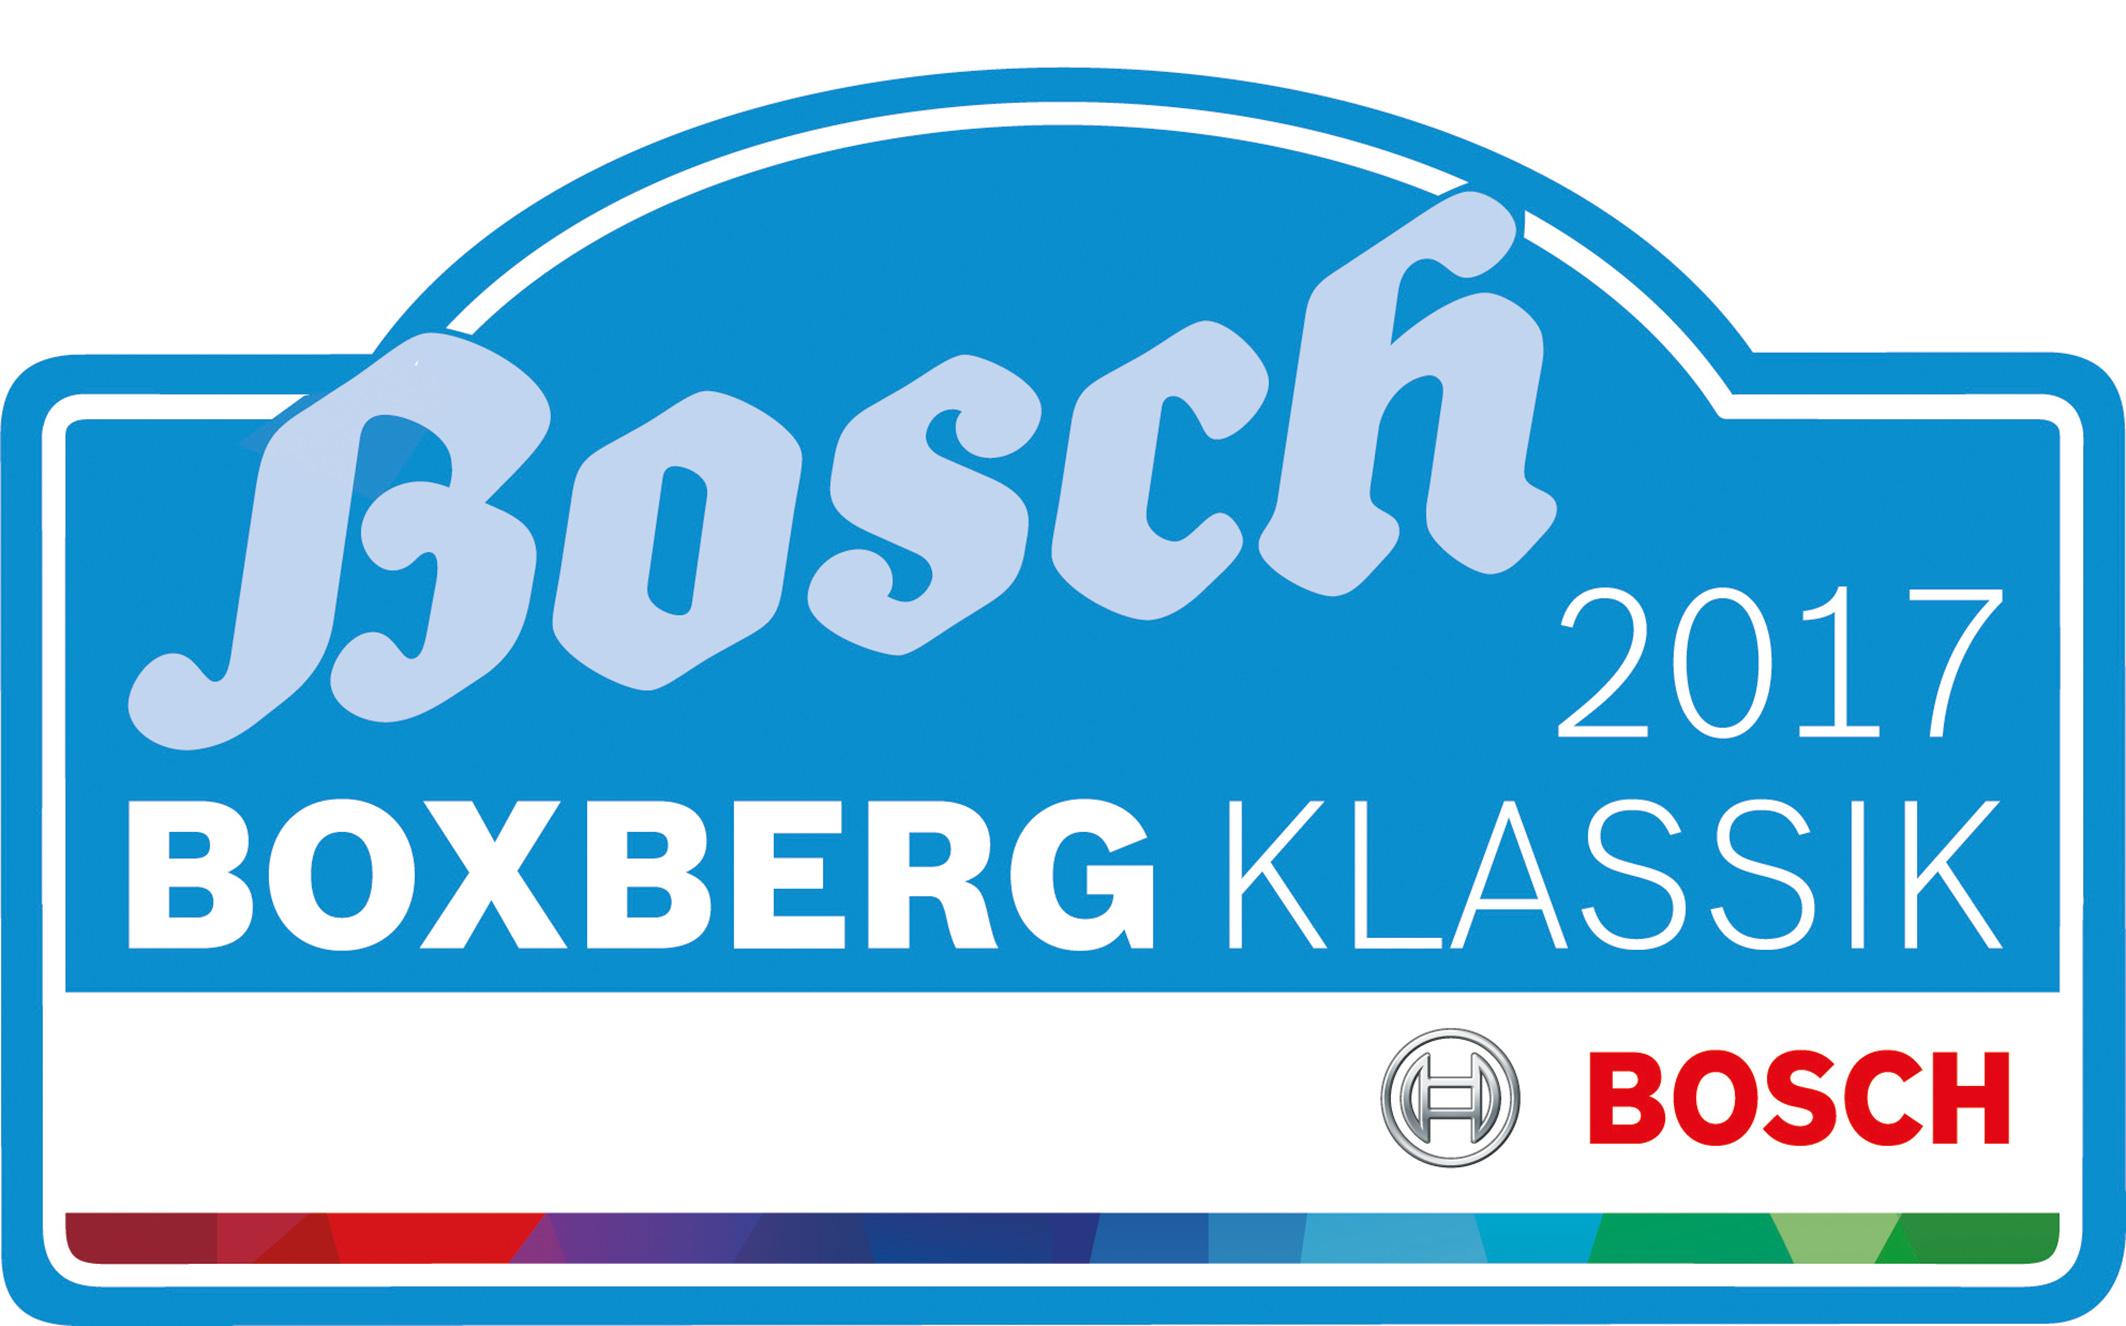 Die Bosch Boxberg Klassik Rallye startet 2017 bereits zum 18. Mal